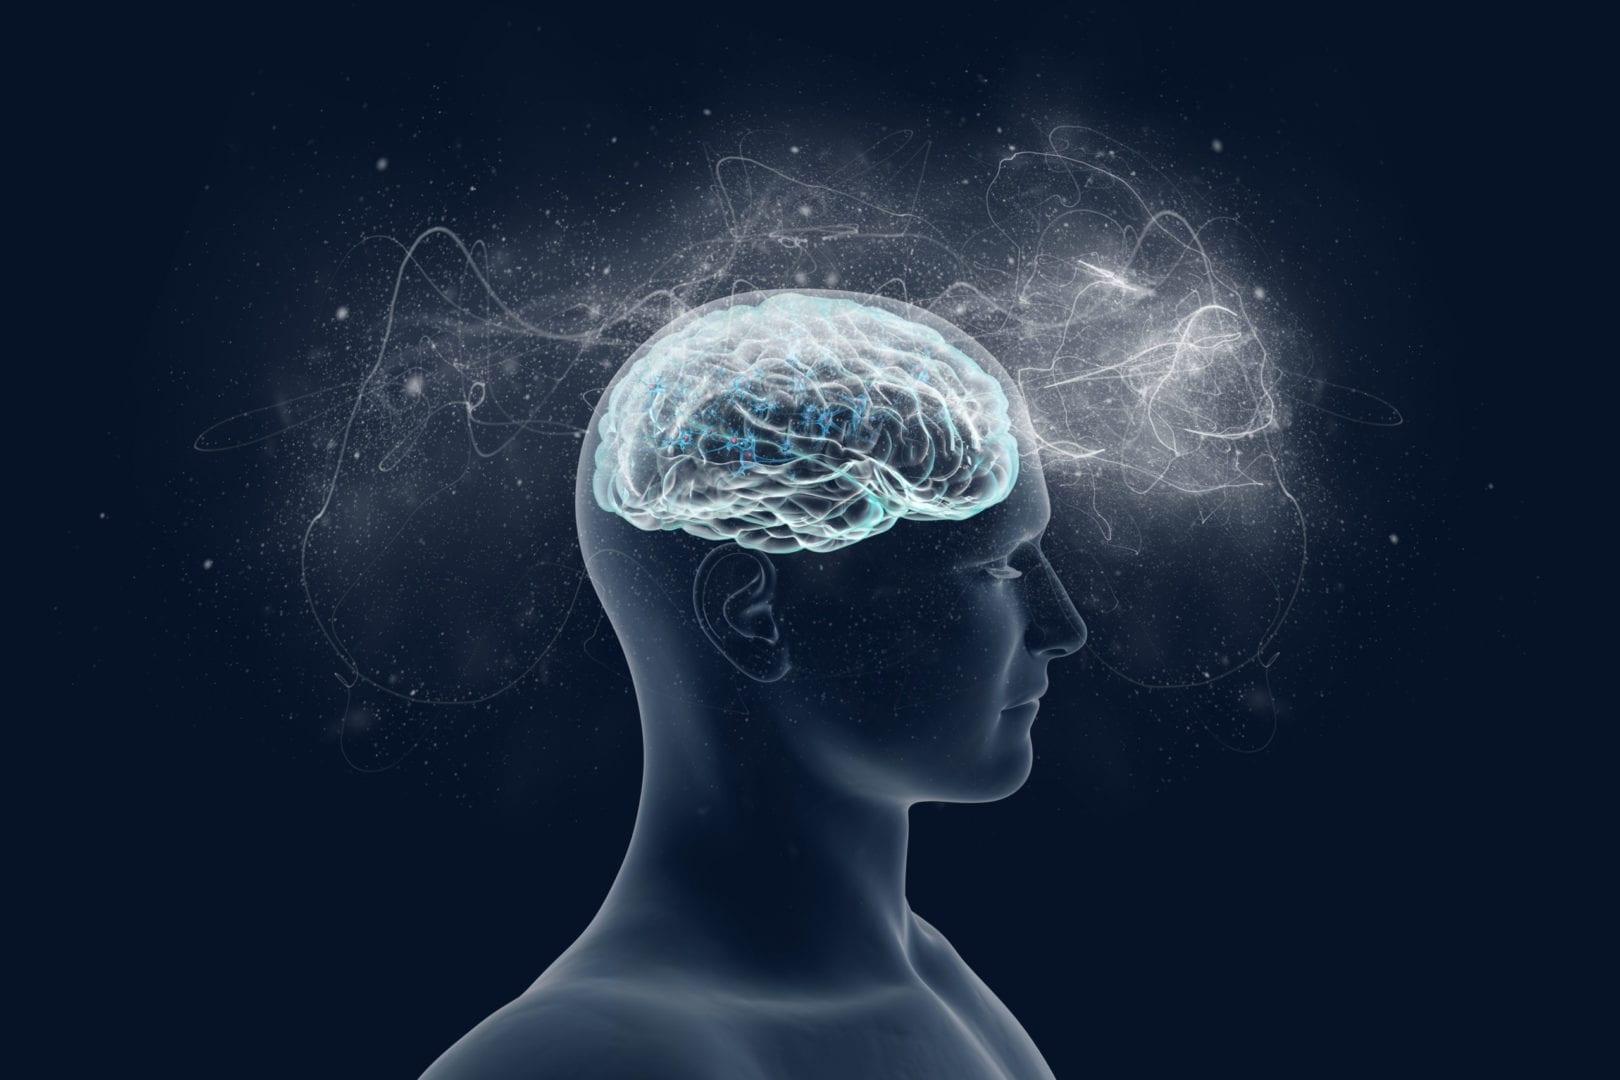 Ketones: Your Brain's Preferred Fuel Source